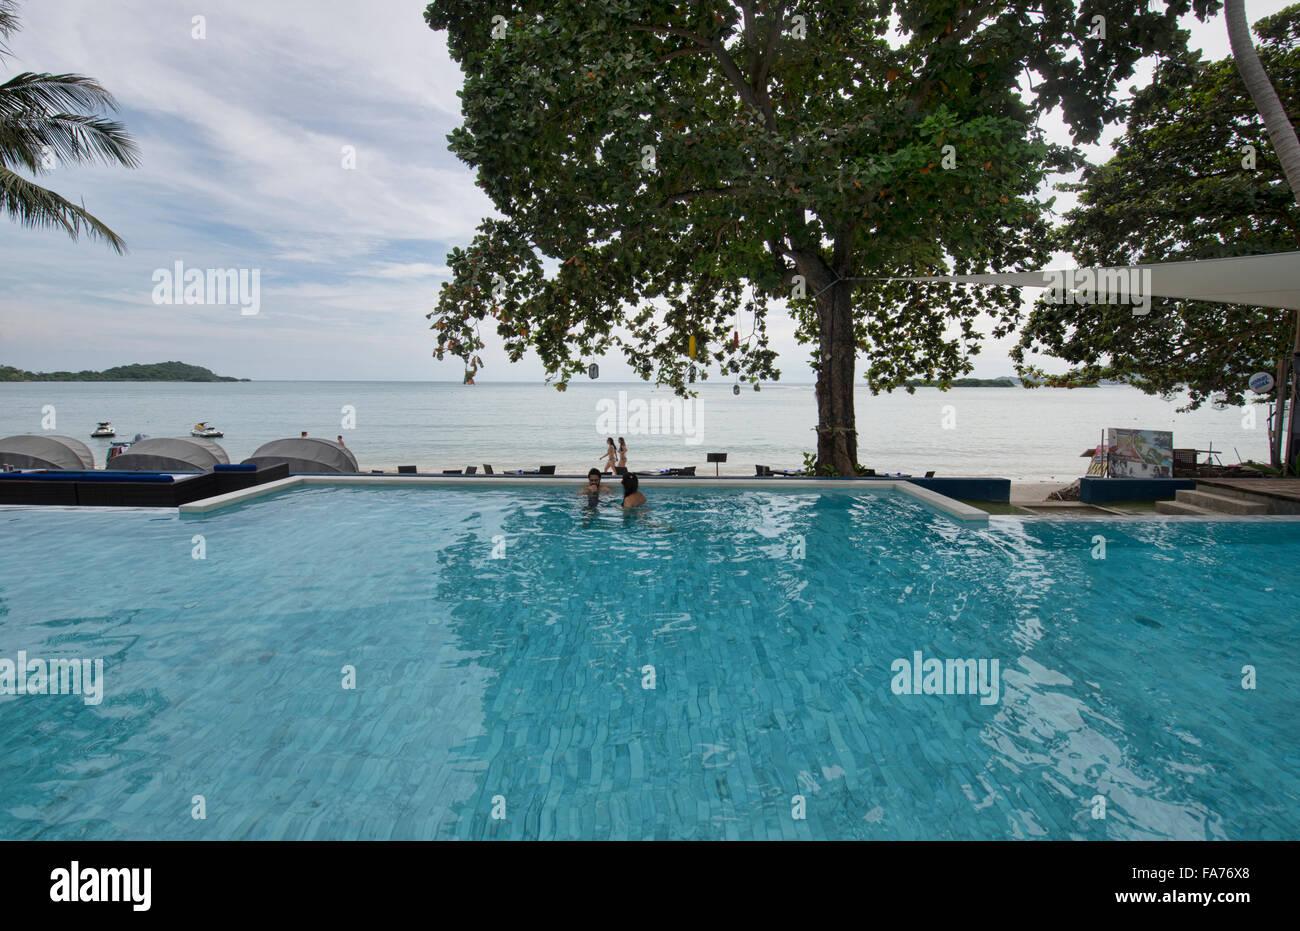 Enjoying the pool and the beach on Koh Samui island, Thailand - Stock Image